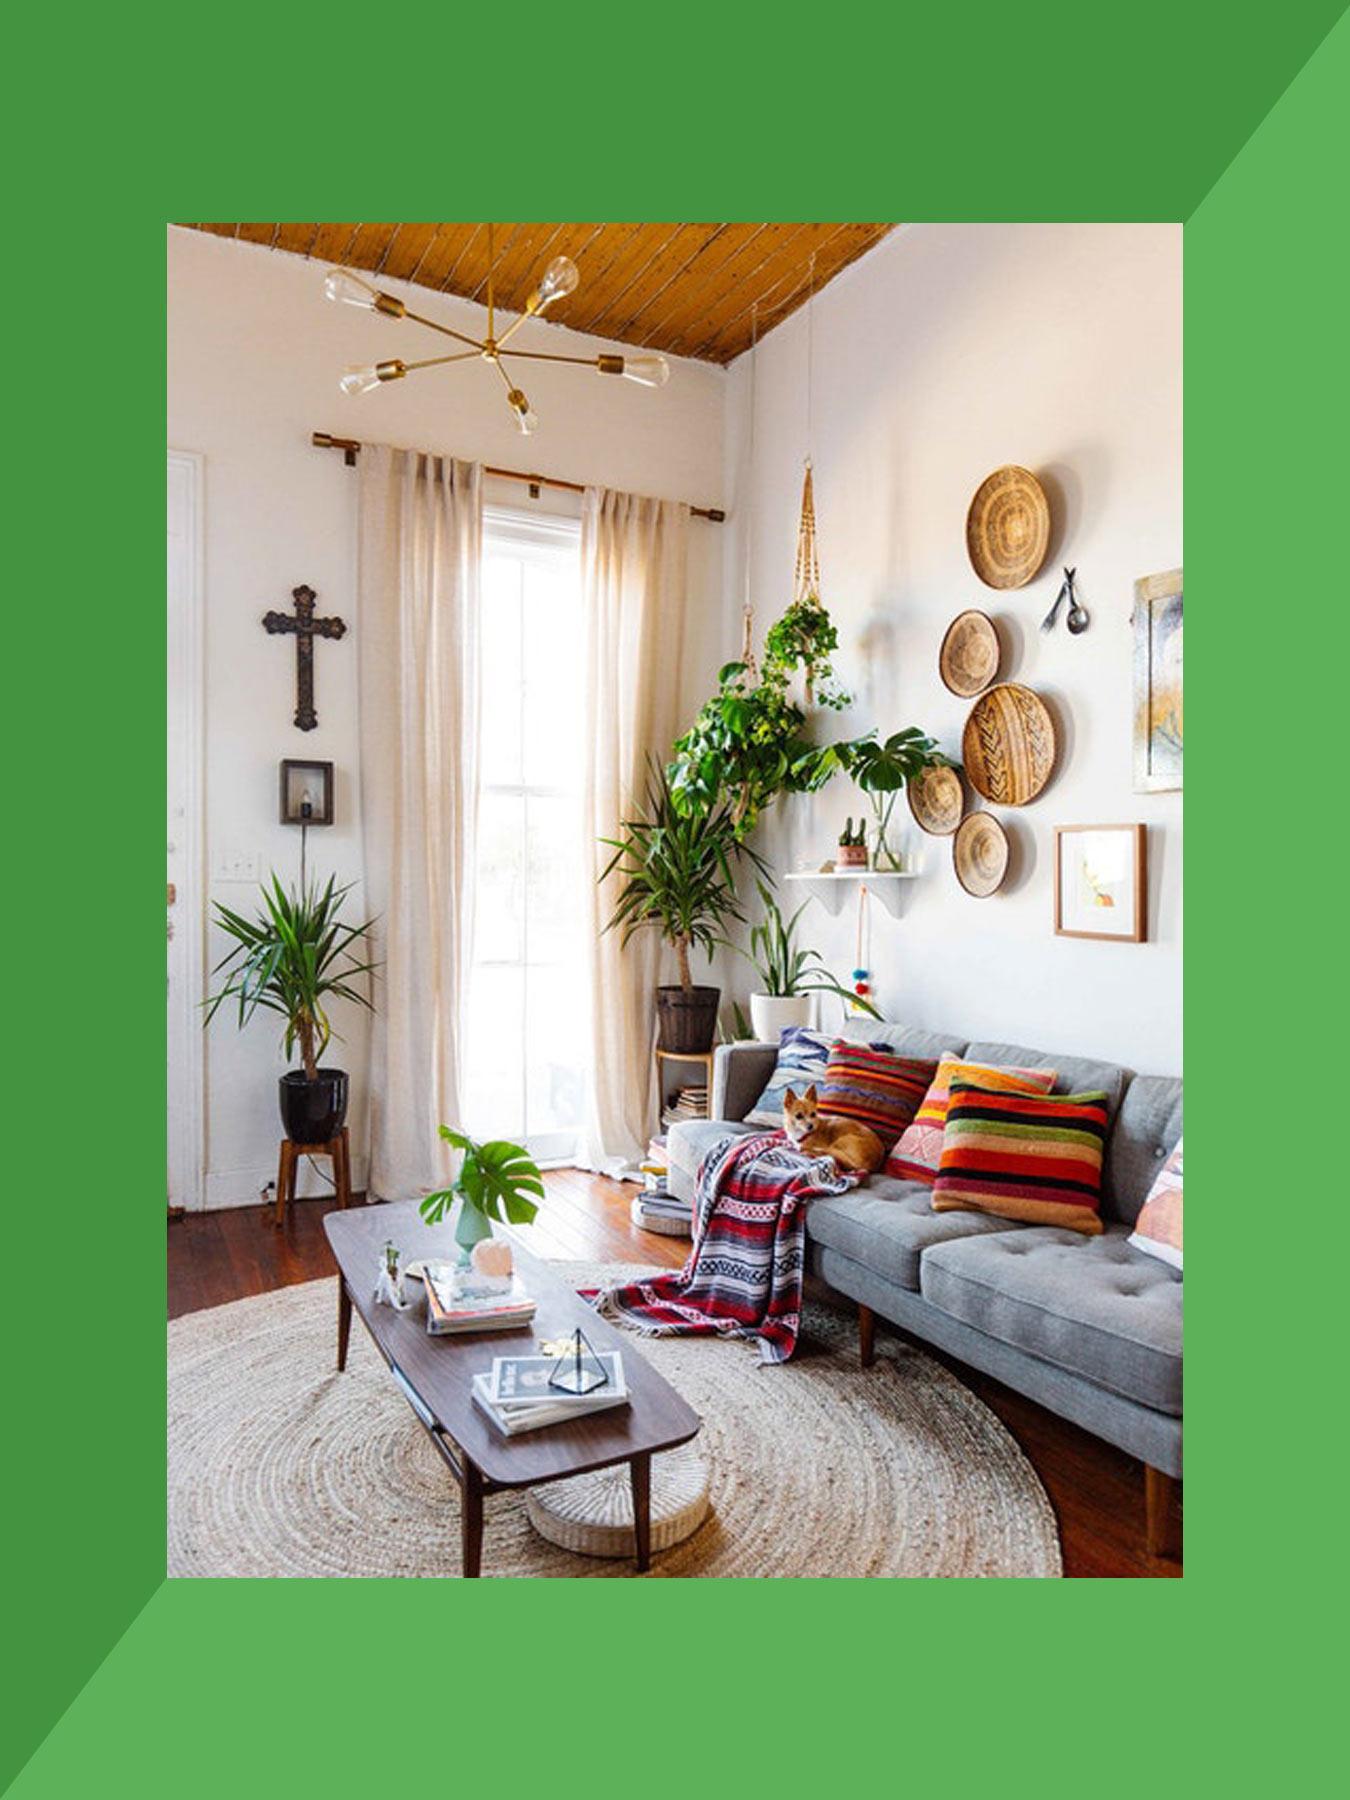 5 coole deko ideen f r eure w nde nylon. Black Bedroom Furniture Sets. Home Design Ideas